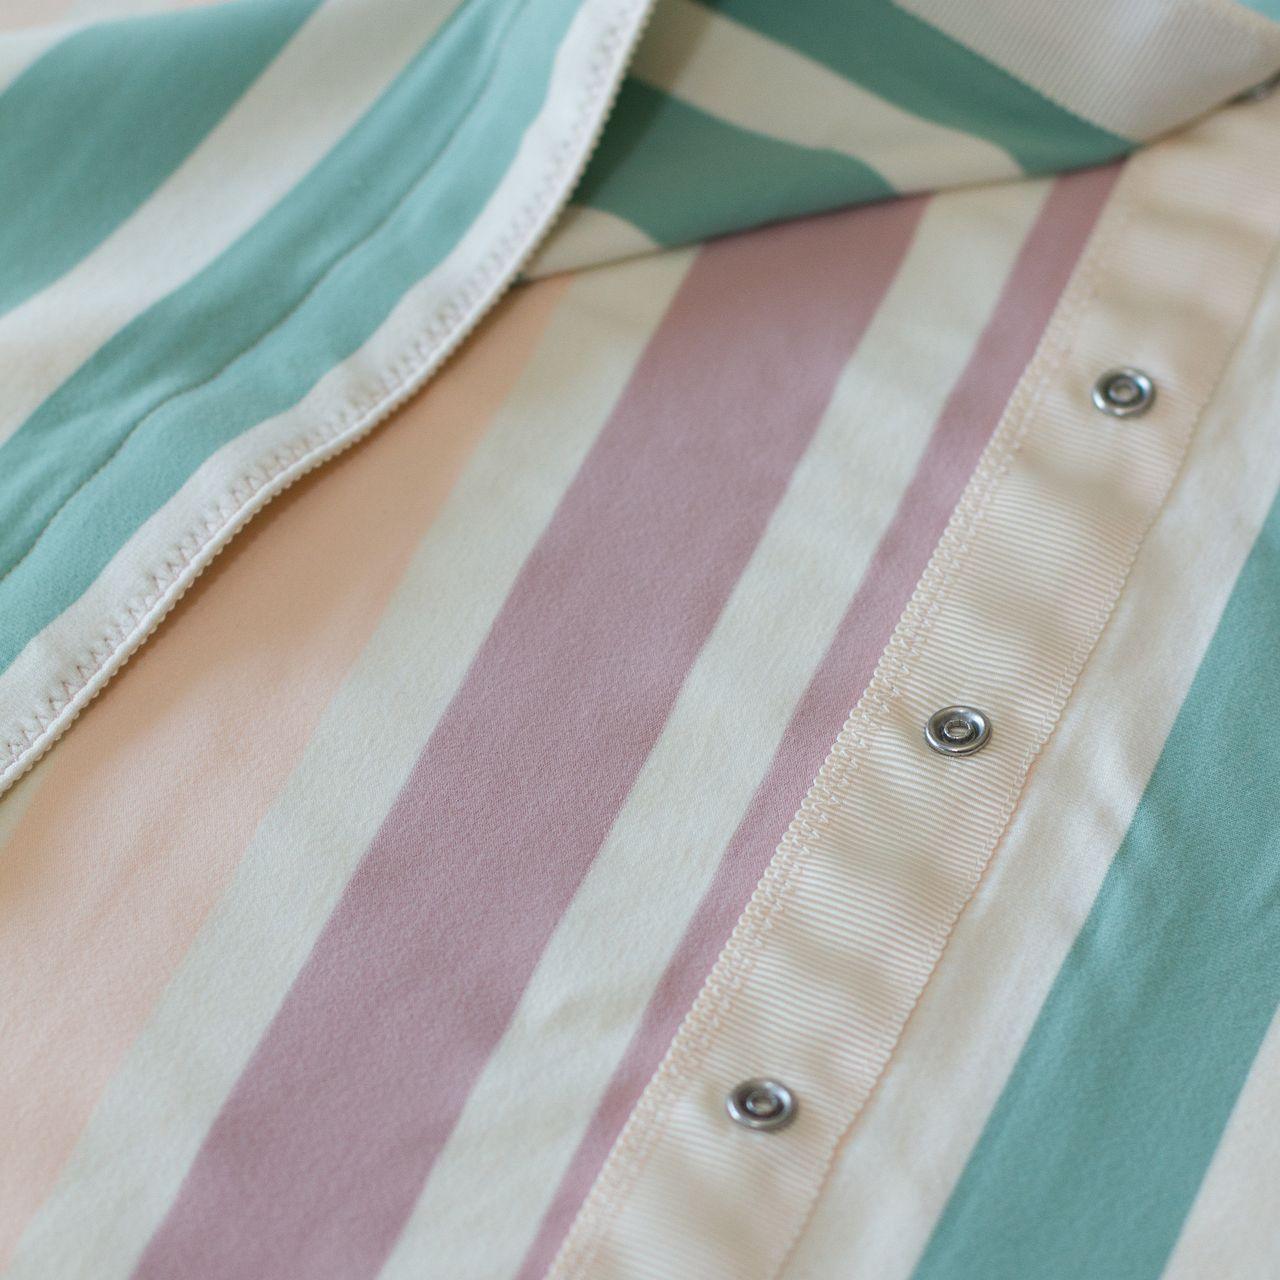 Lululemon Vinyasa Scarf - Triplet Twin Stripe Heathered Angel Wing Multi (First Release)